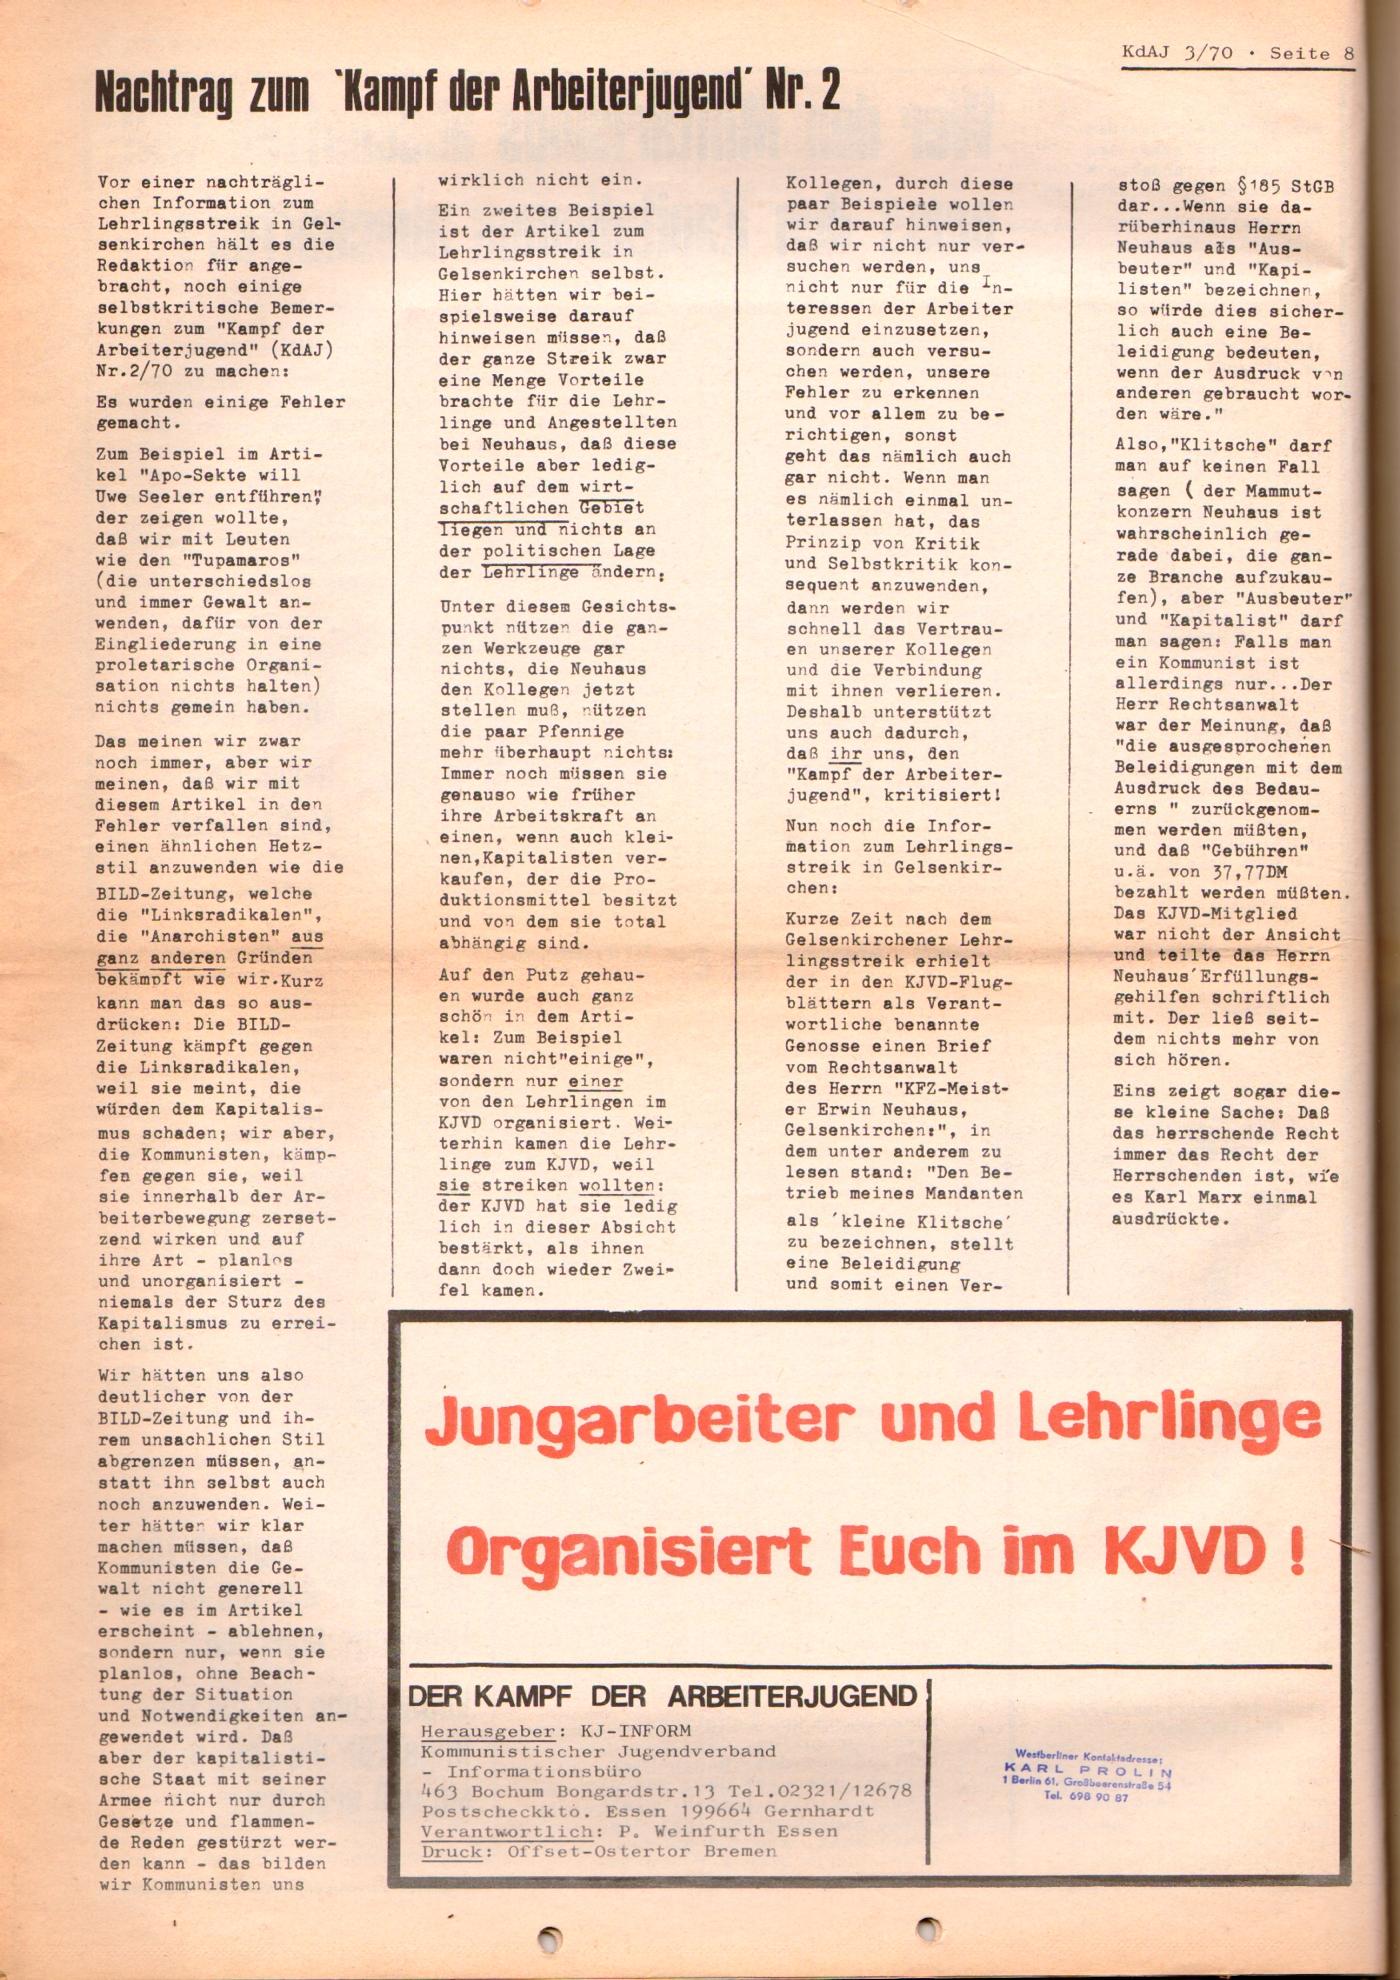 KDAJ, 1. Jg., August 1970, Nr. 3, Seite 8